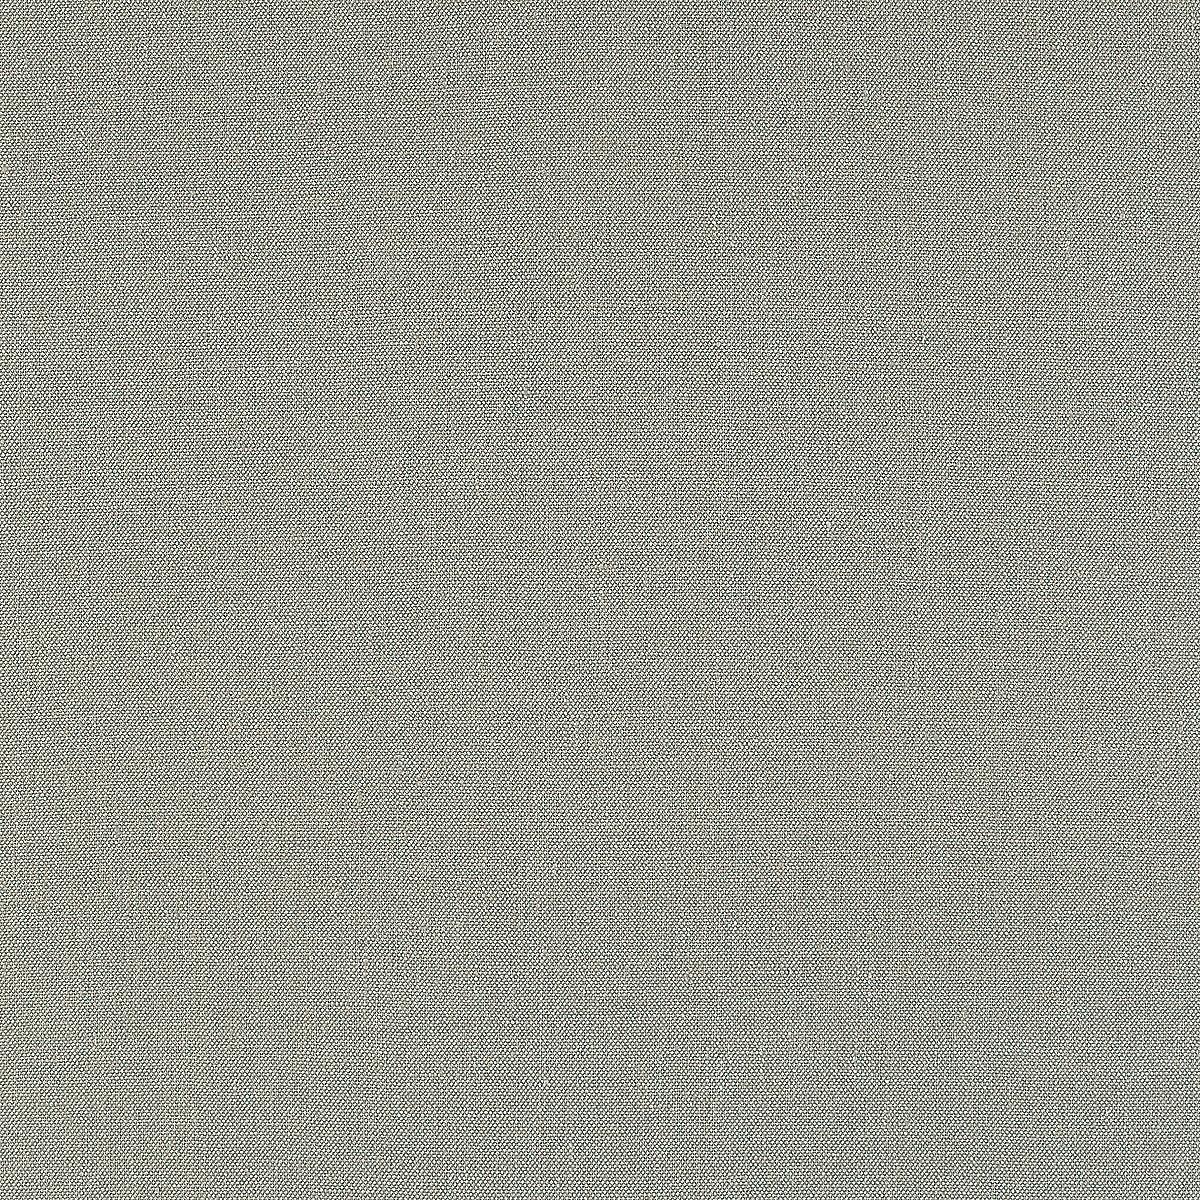 Belgian Linen: Zinc (fabric yardage)